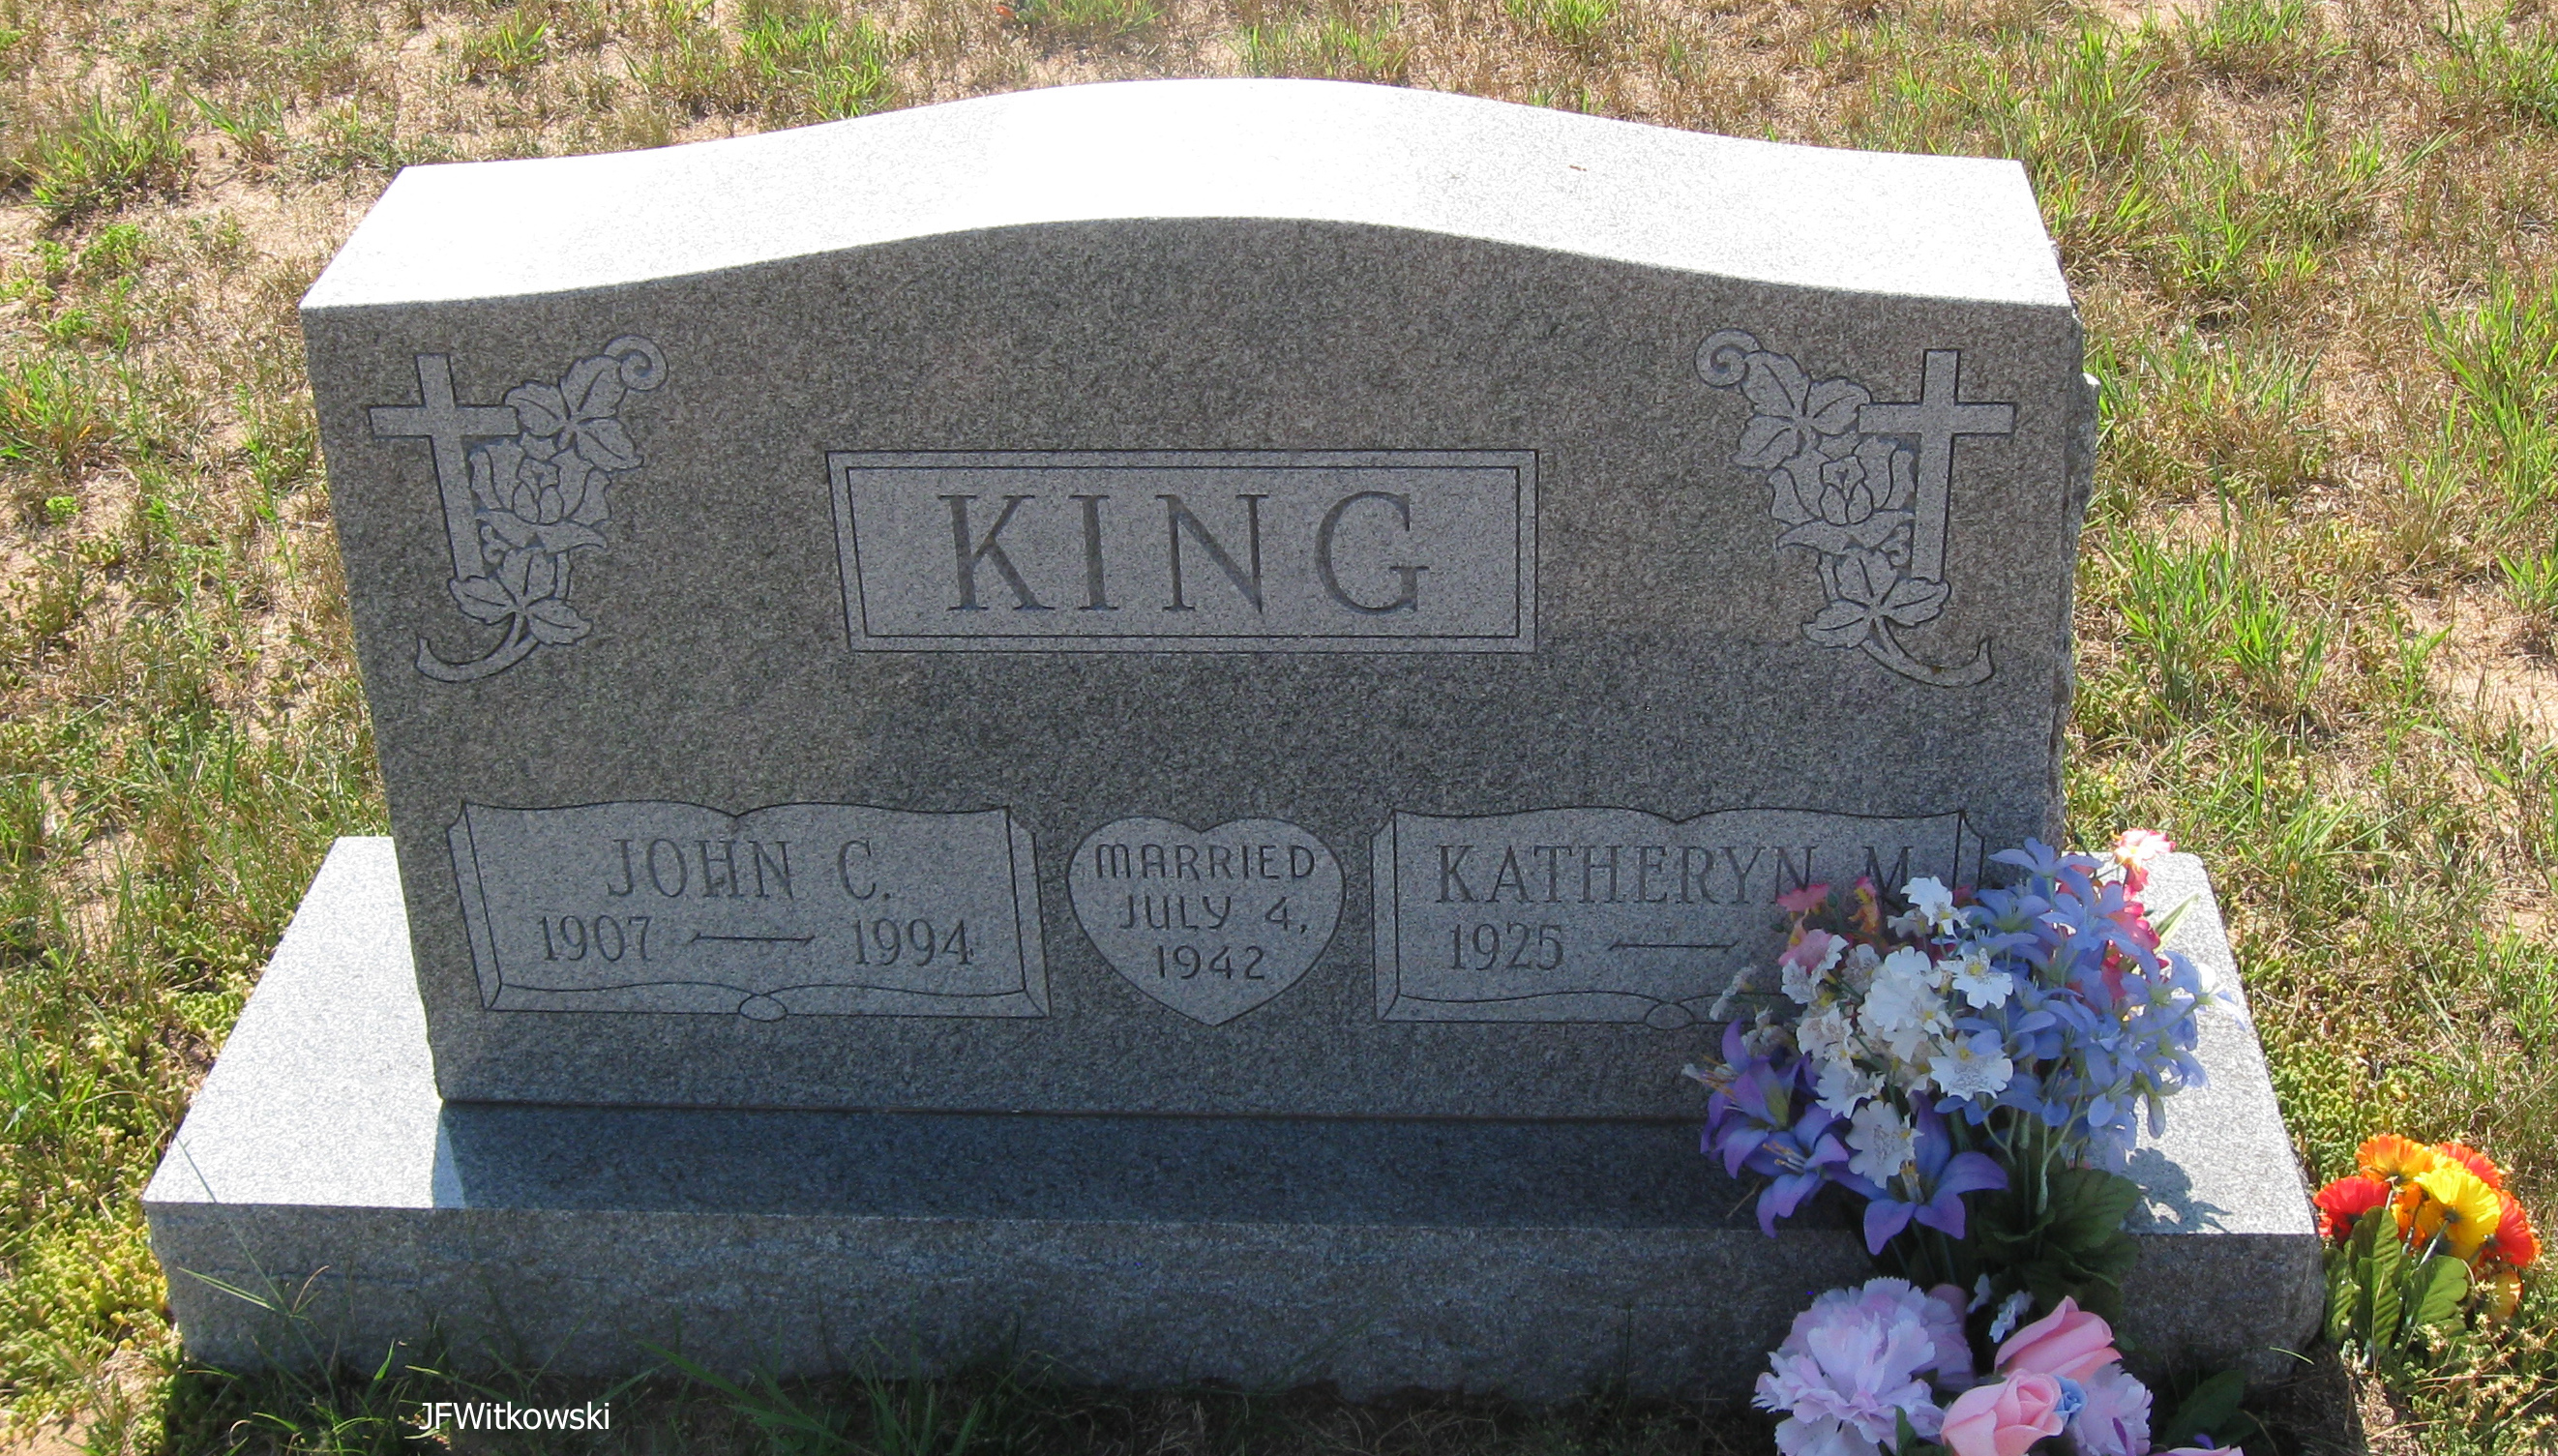 John Calvert King